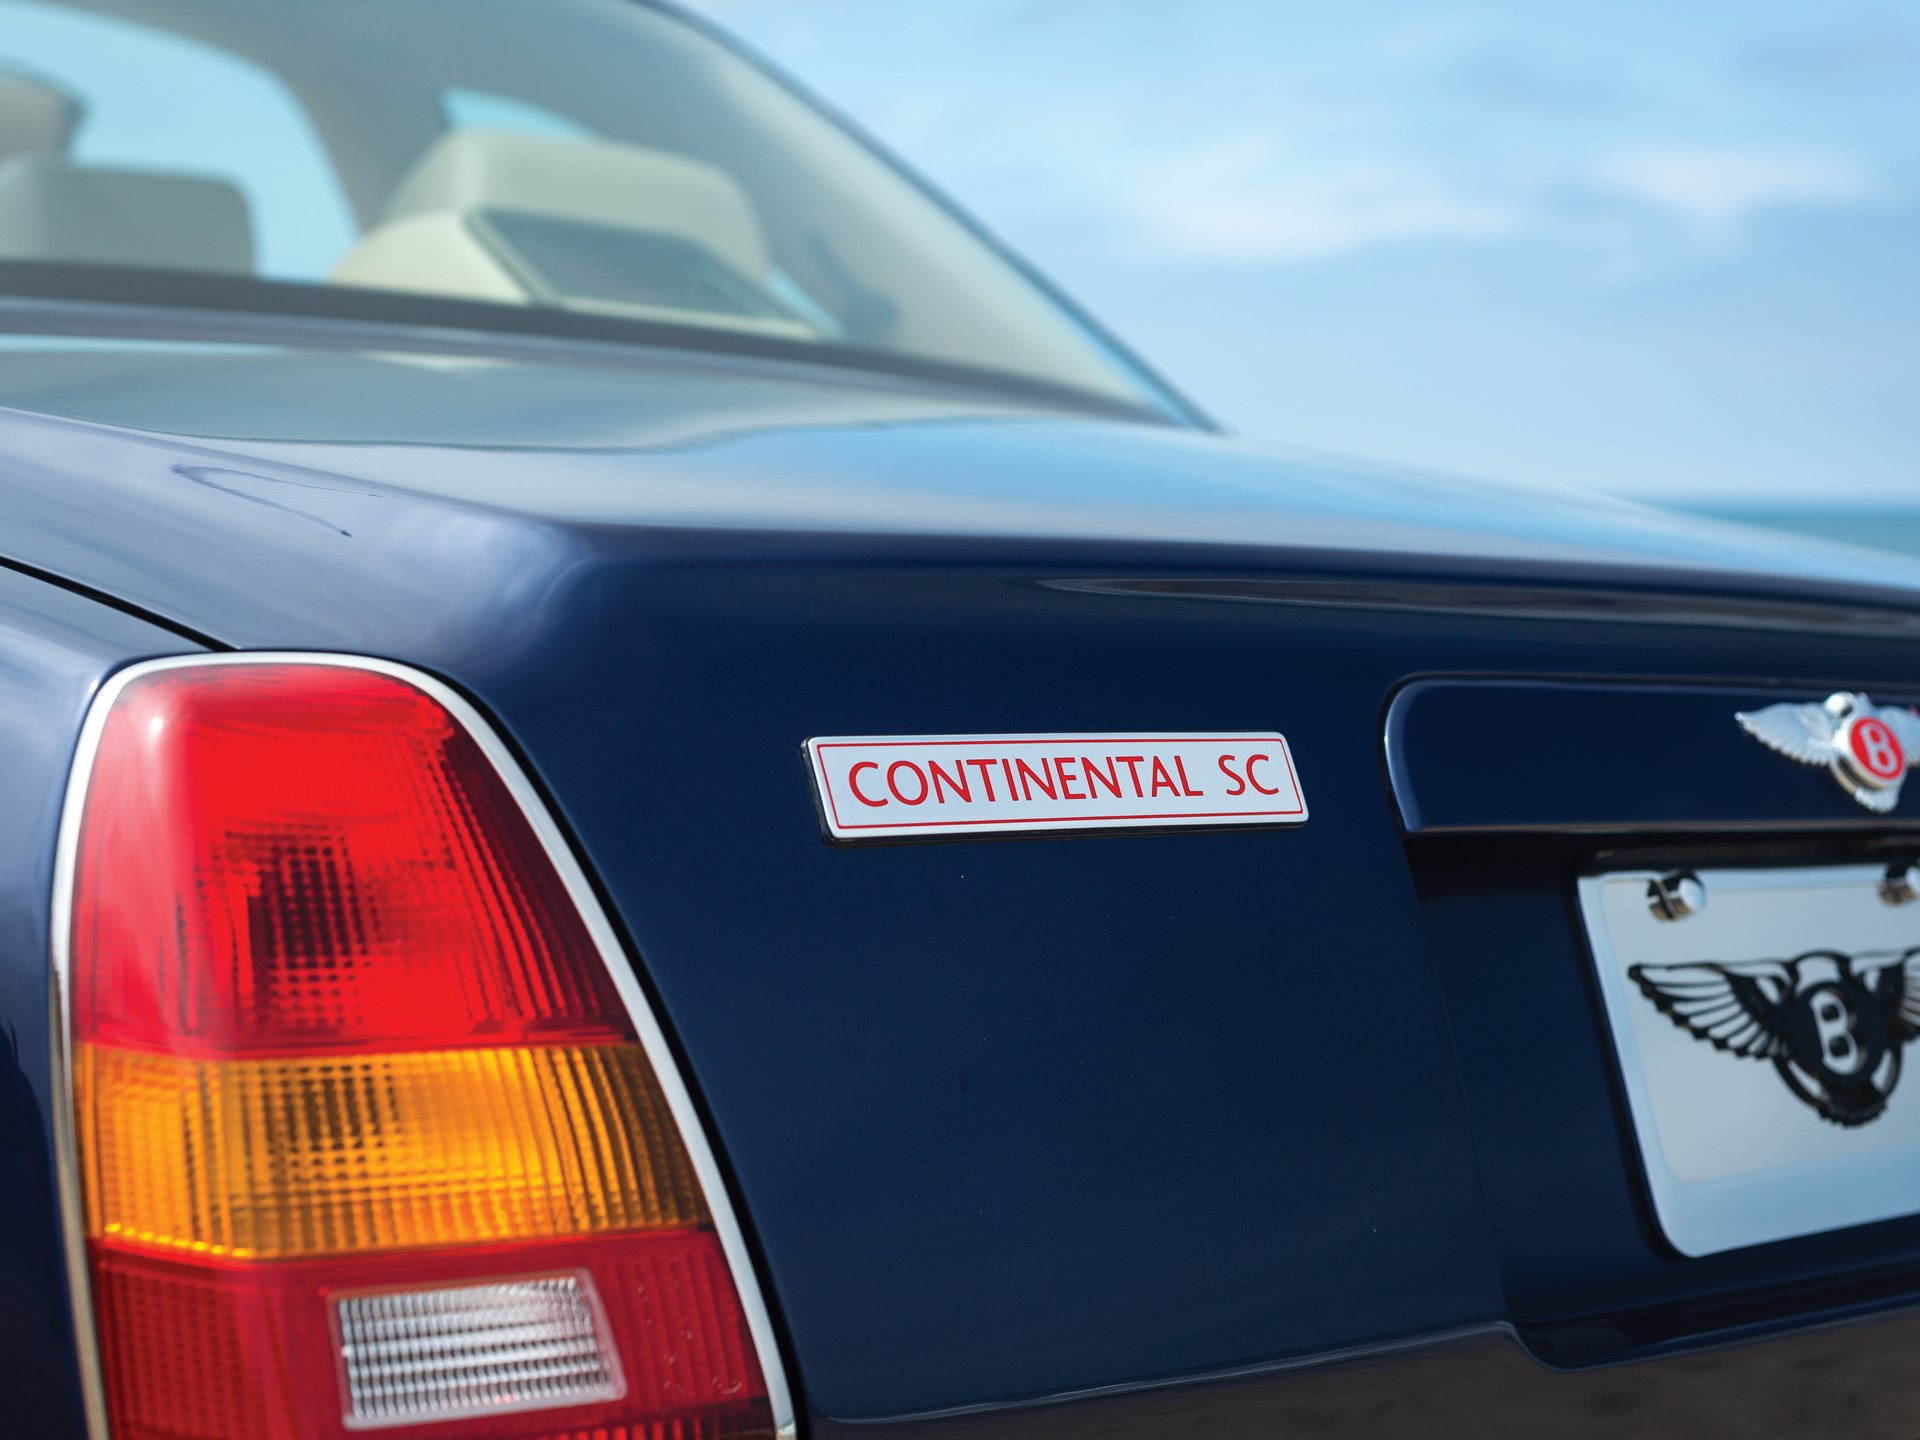 2000 Bentley Continental SC